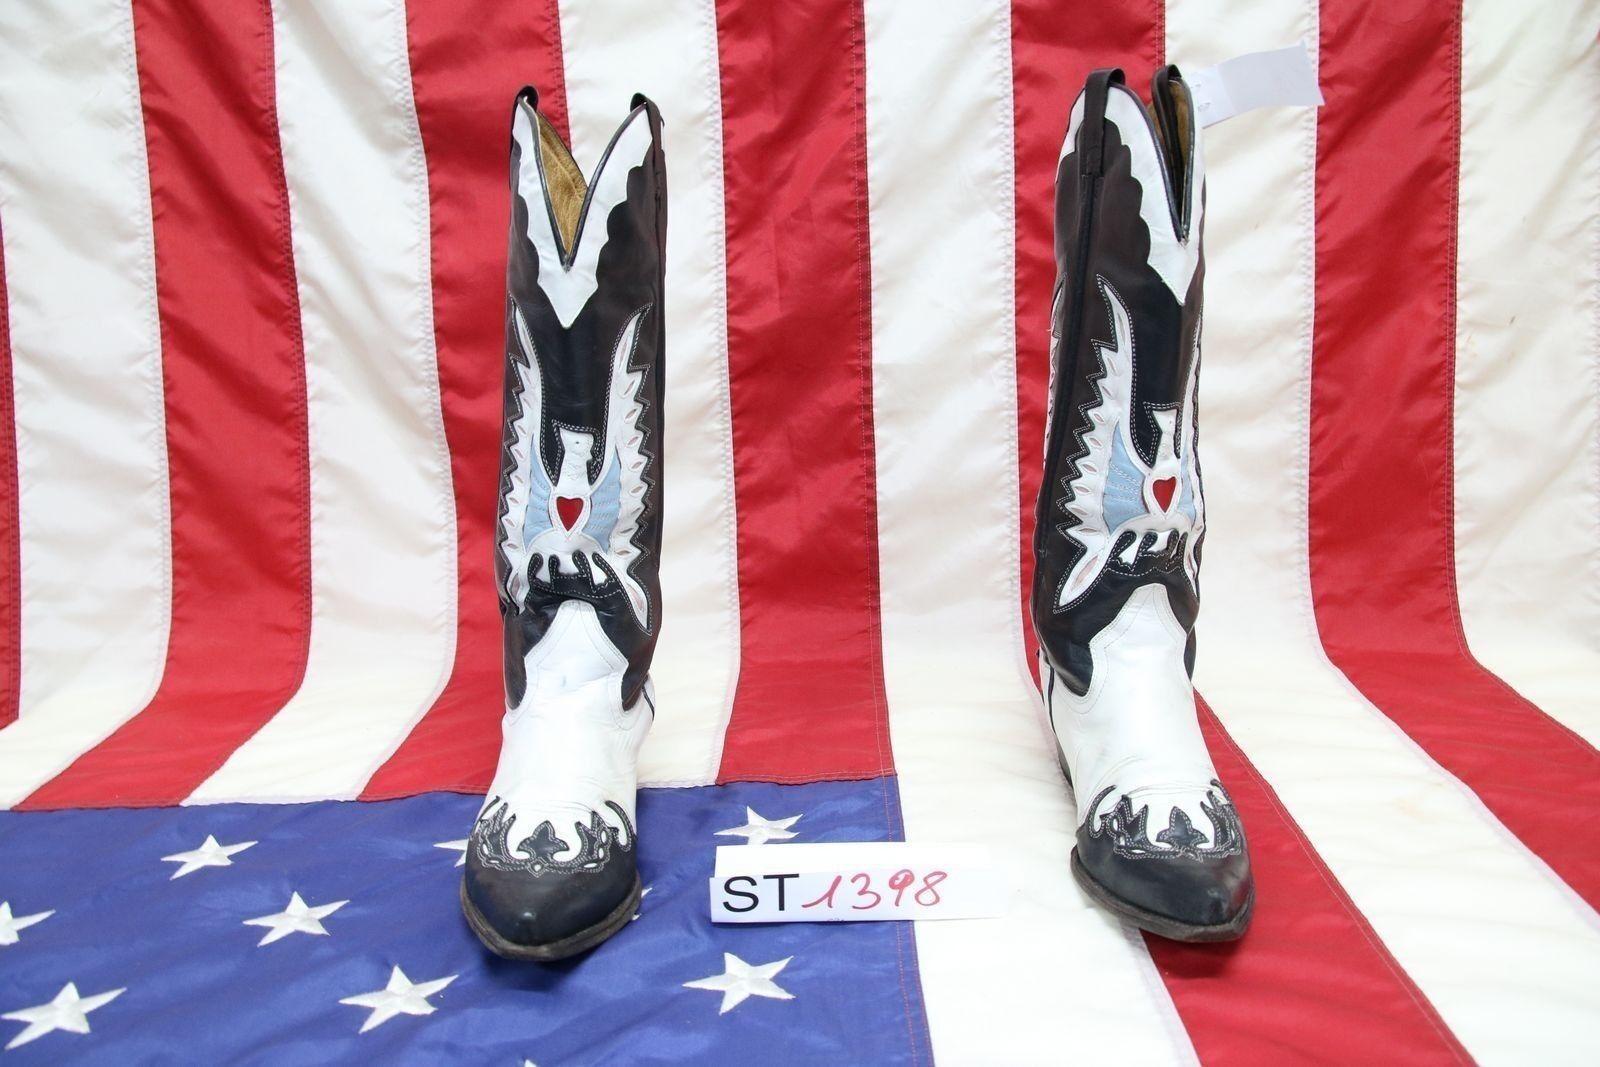 Stiefel Buffalo N.41 (cod. ST1398) Stiefel Western Country Herren gebraucht